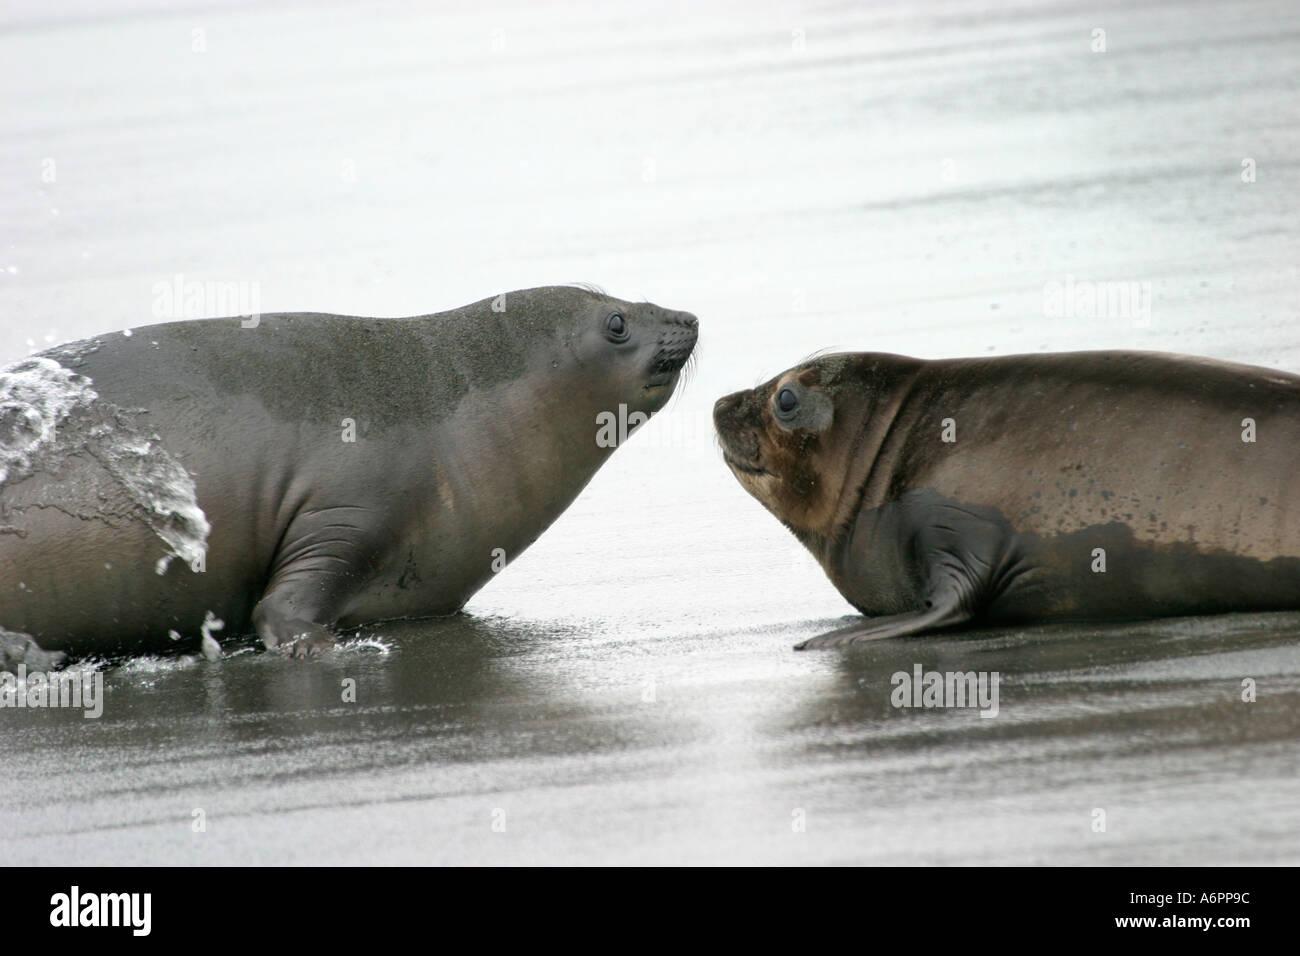 Elephant Seal pups, South Georgia Island, Southern Atlantic Ocean - Stock Image